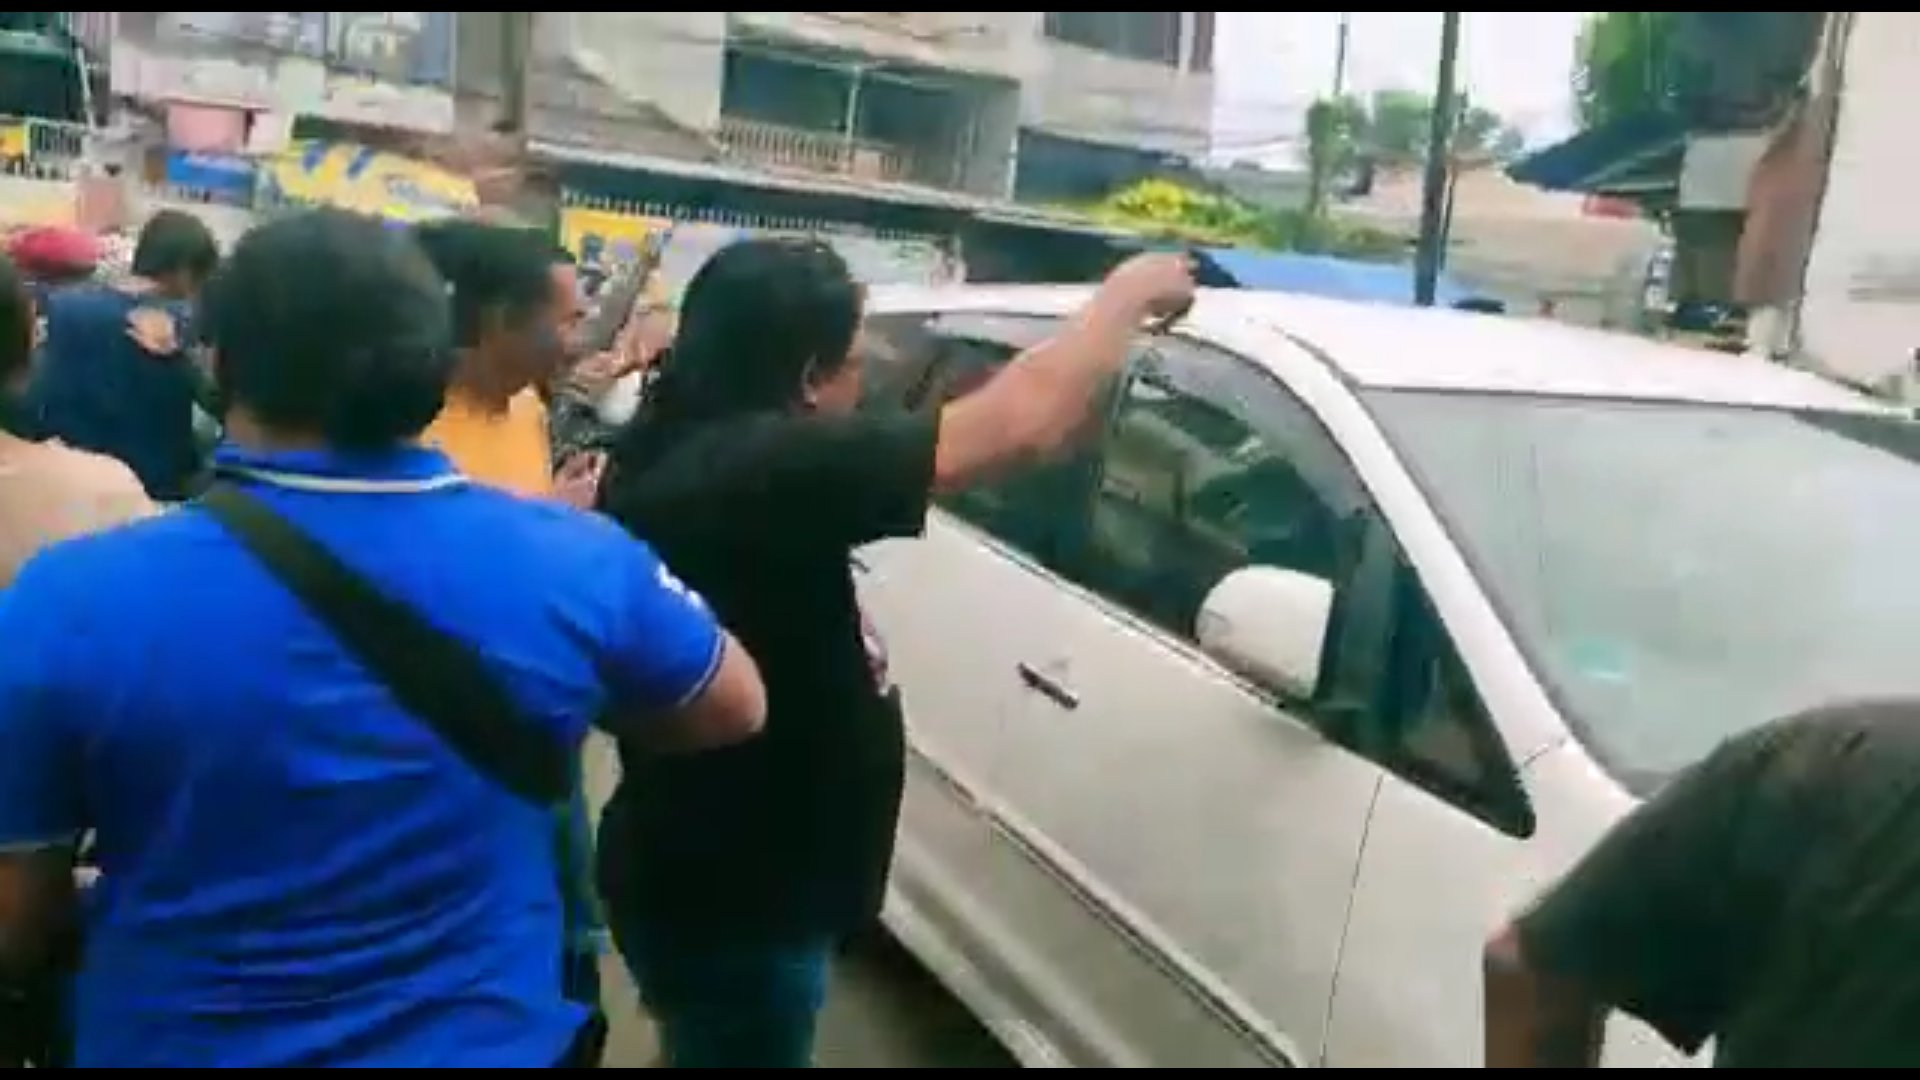 Pengendara Mobil Arogan Keluarkan Pistol Ancam Warga, Dikepung Polisi